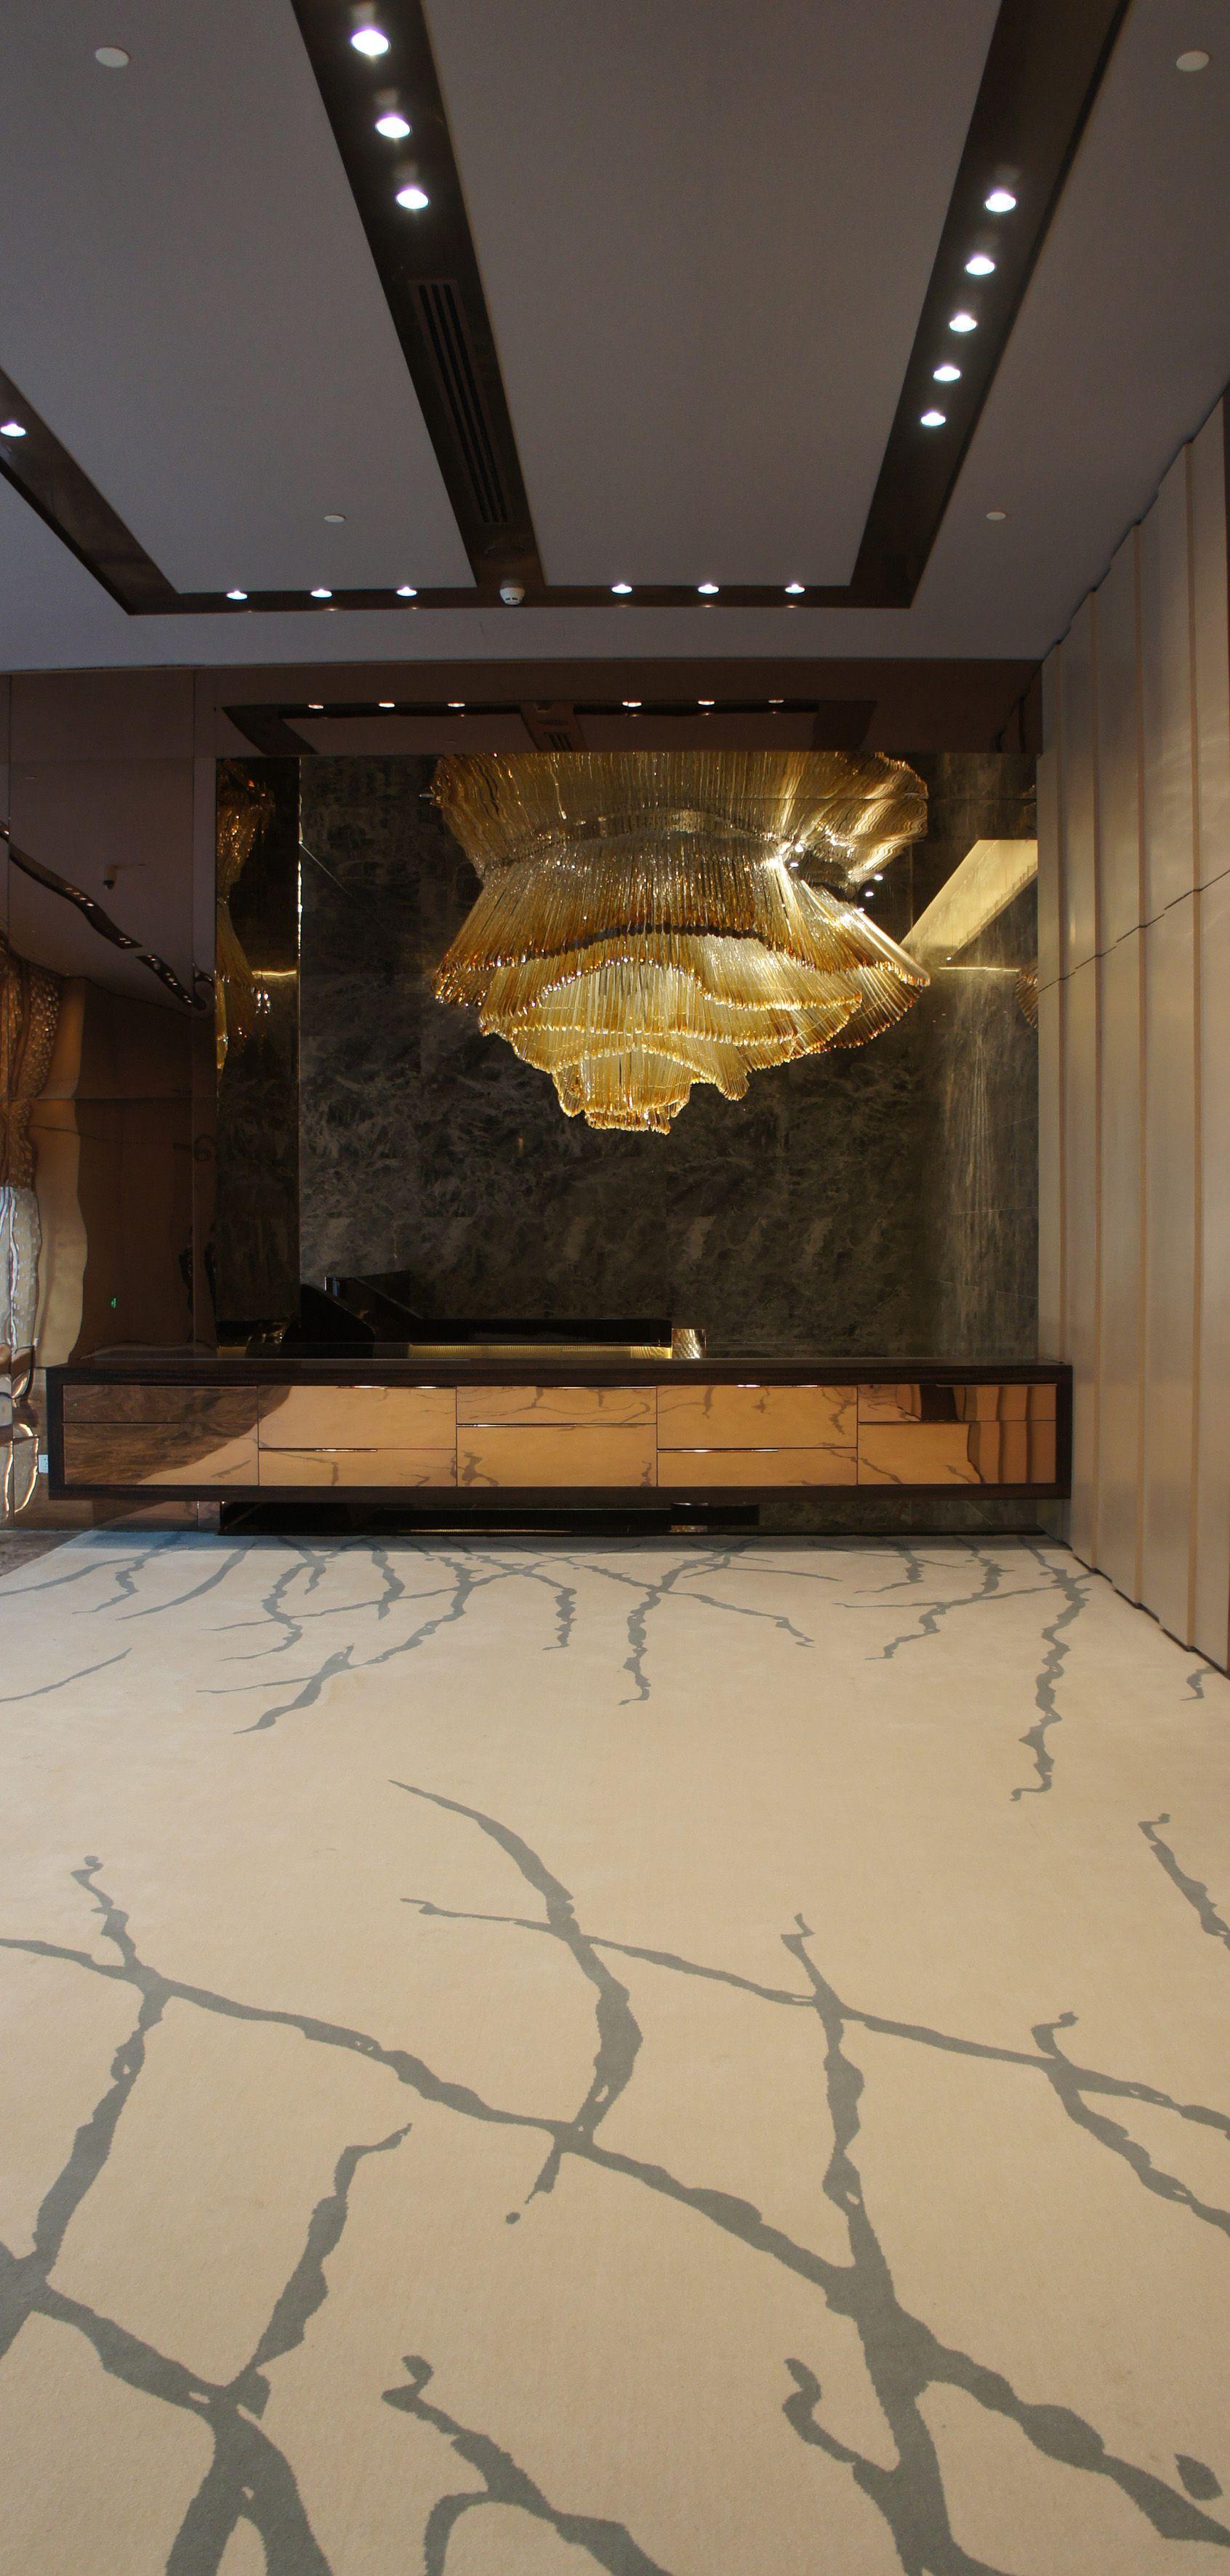 conrad beijing,dragonpace lighting. vintage, modern, luxury or